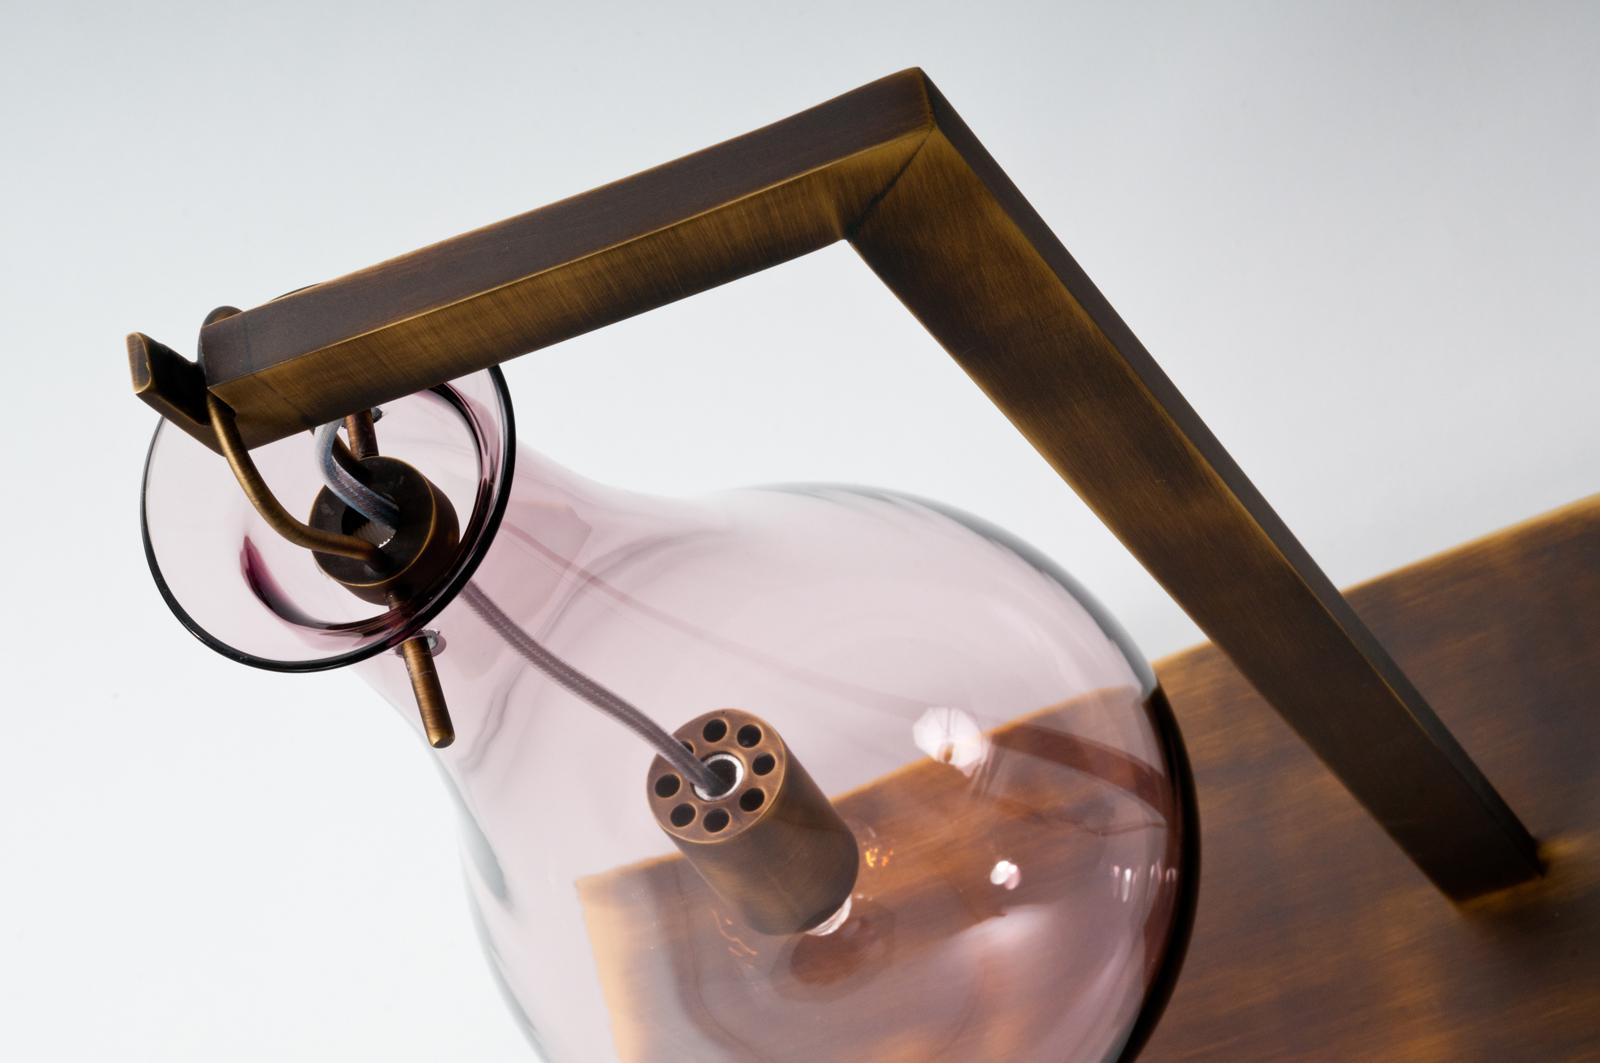 drop-table-40-1-bronze-amethyst-patrick-naggar-veronese-3.jpg